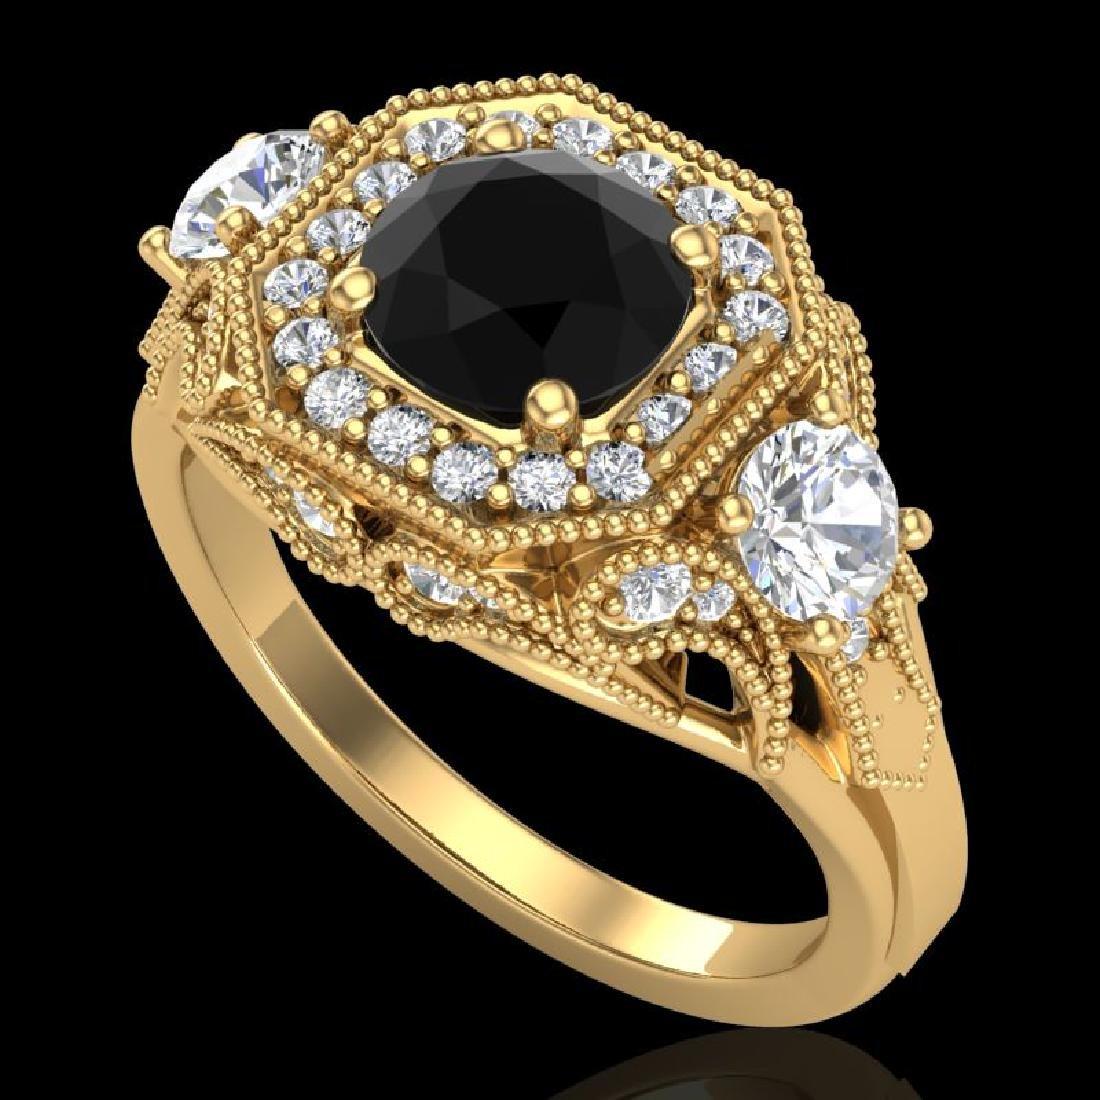 2.11 CTW Fancy Black Diamond Solitaire Art Deco 3 Stone